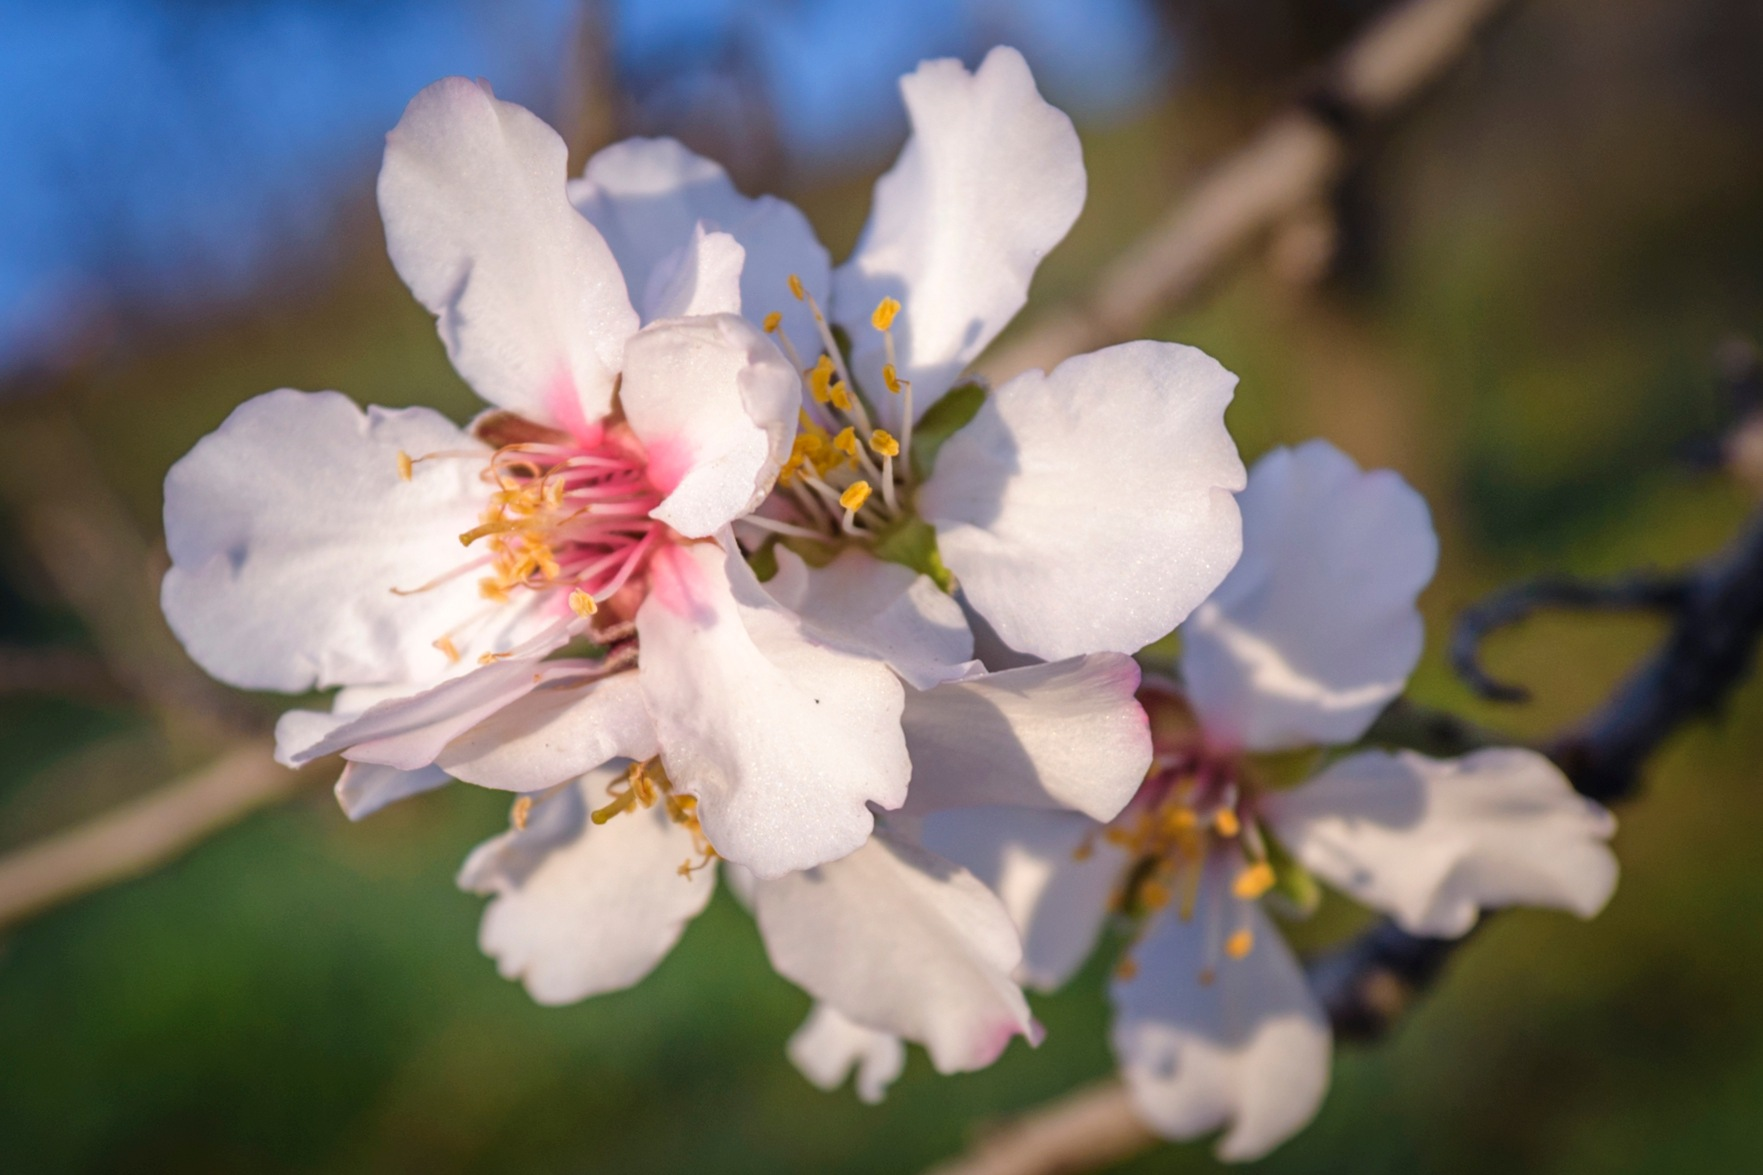 Almond flowers by Noureddine Belfethi